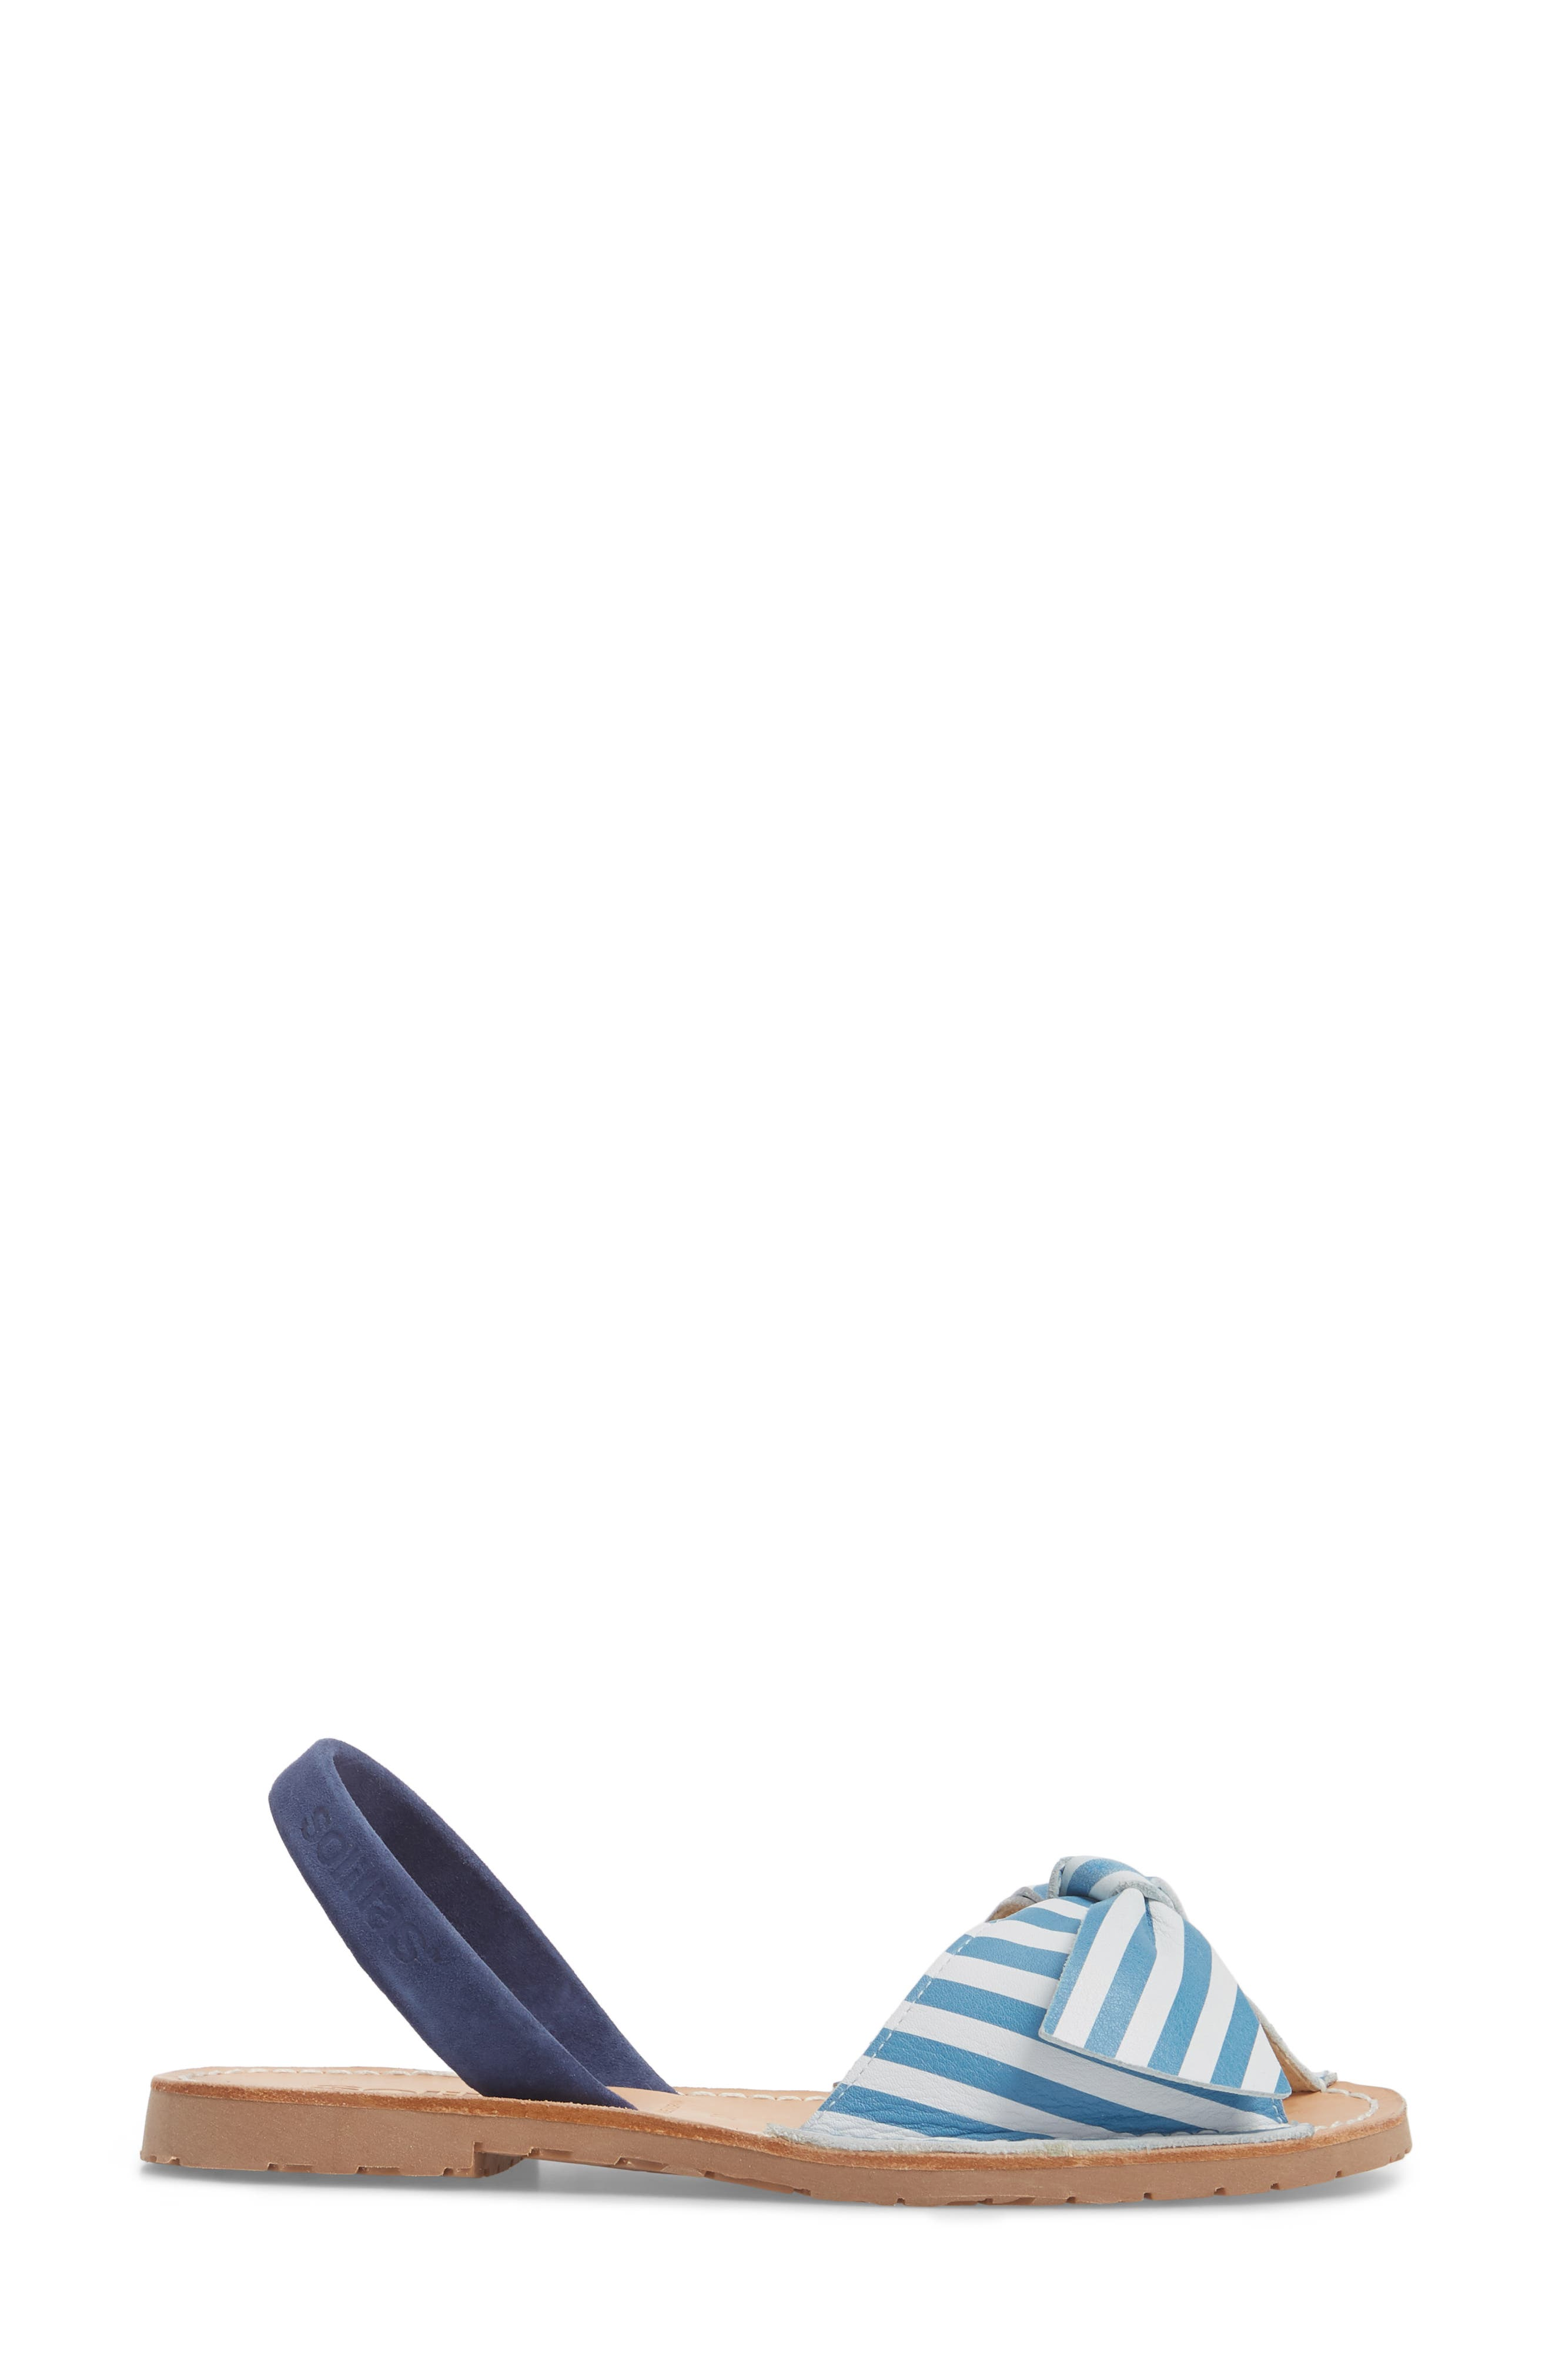 Bow Sandal,                             Alternate thumbnail 3, color,                             Blue And White